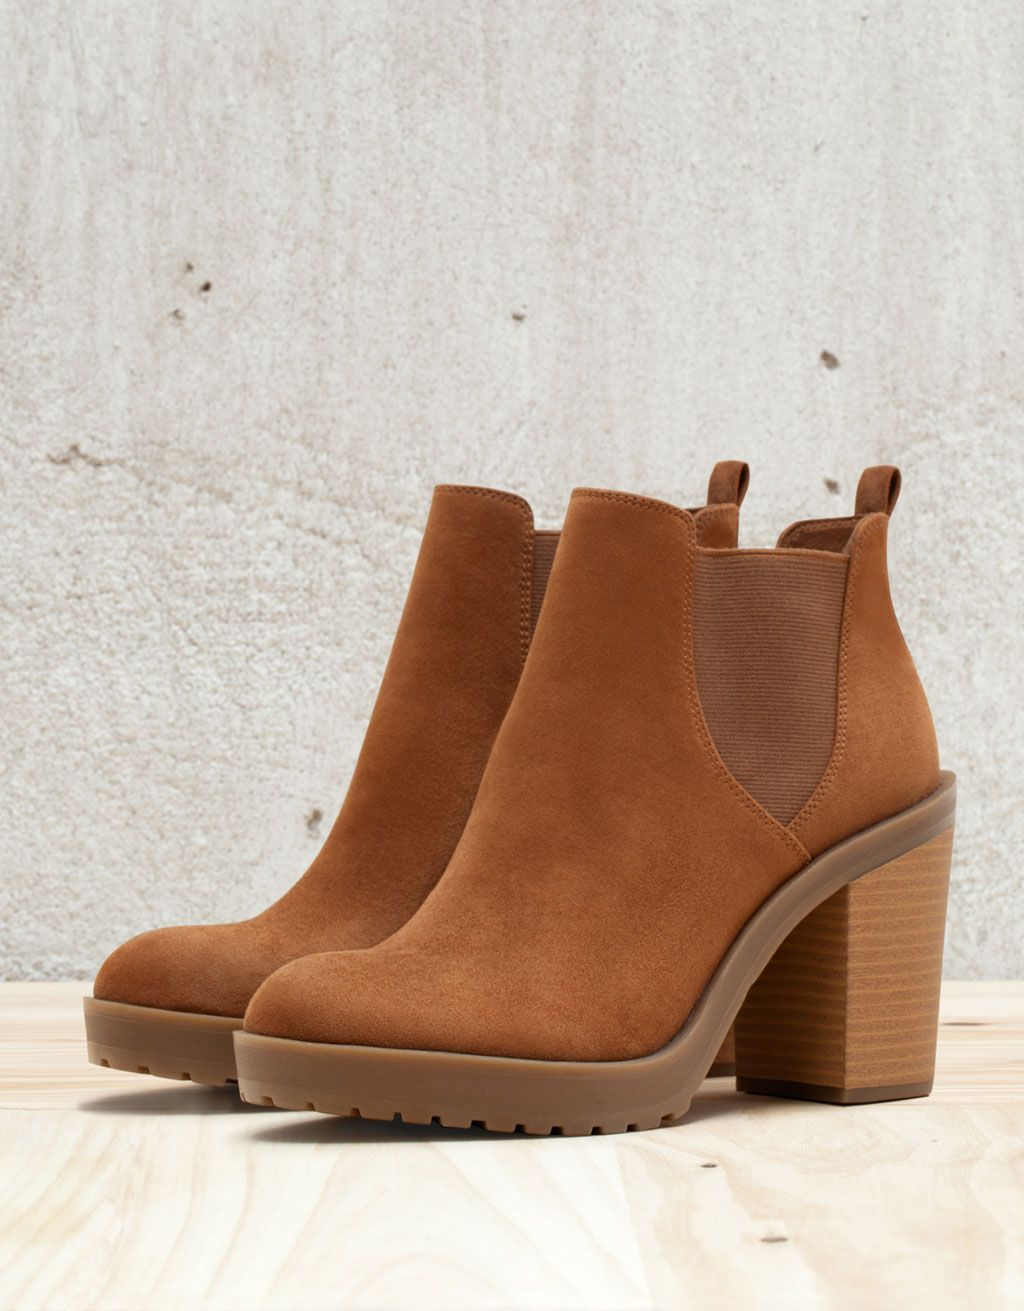 0895daa76fc3 elastic heeled ankle boot - View All - Bershka Israel